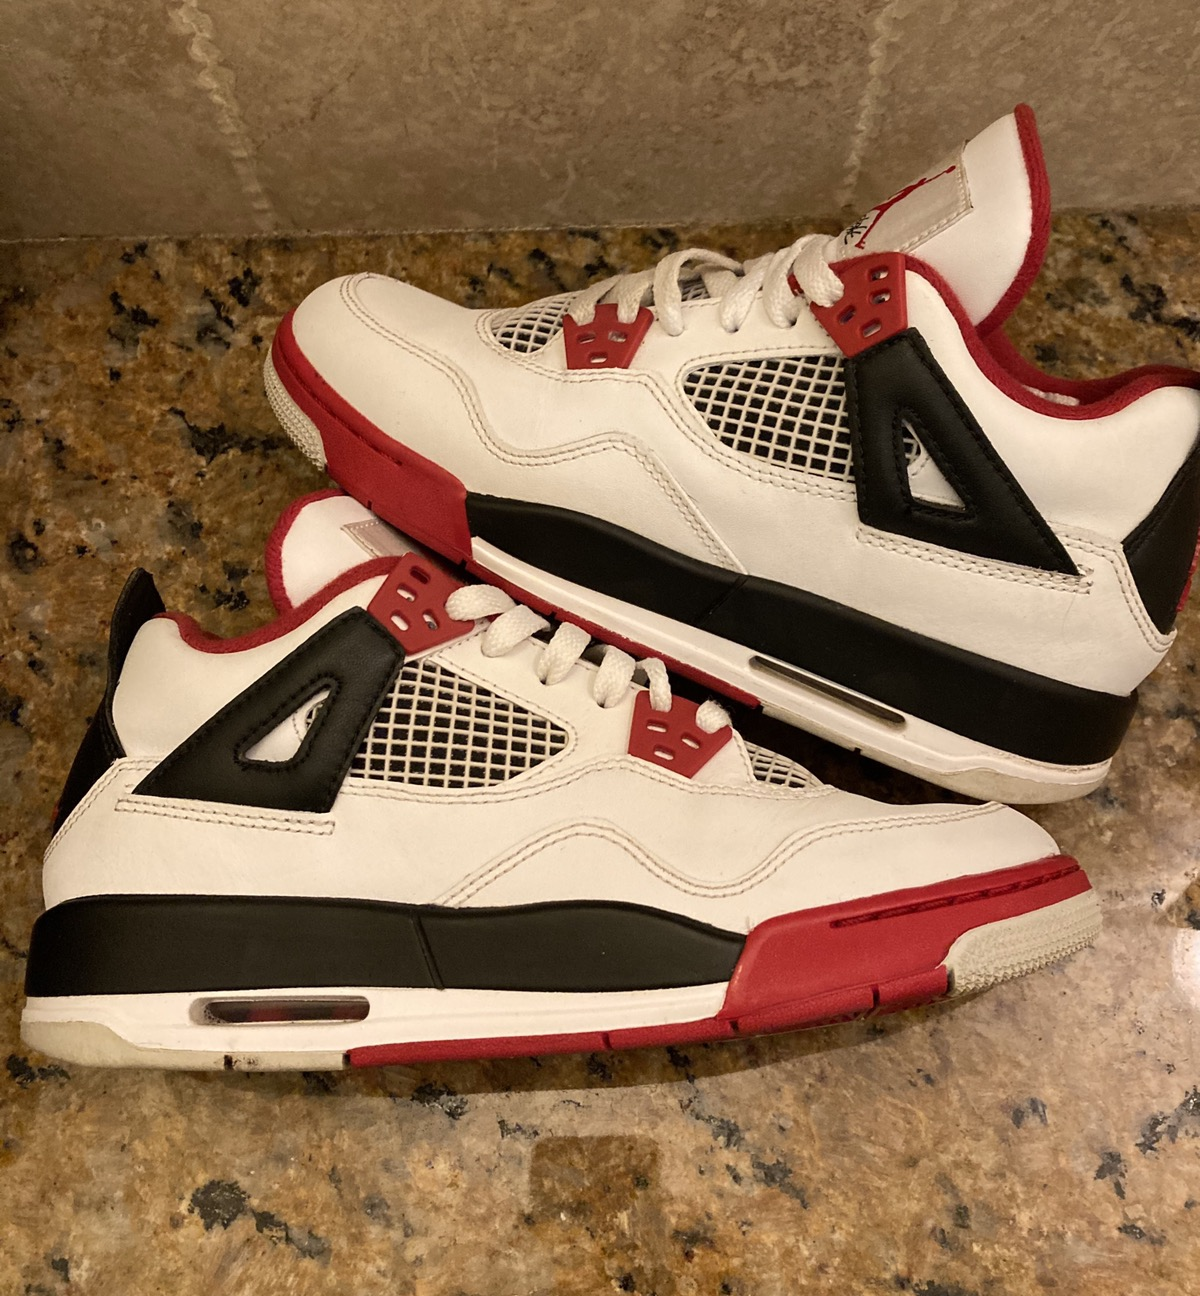 Jordan Brand Air Jordan 4 Retro GS Fire Red 2012